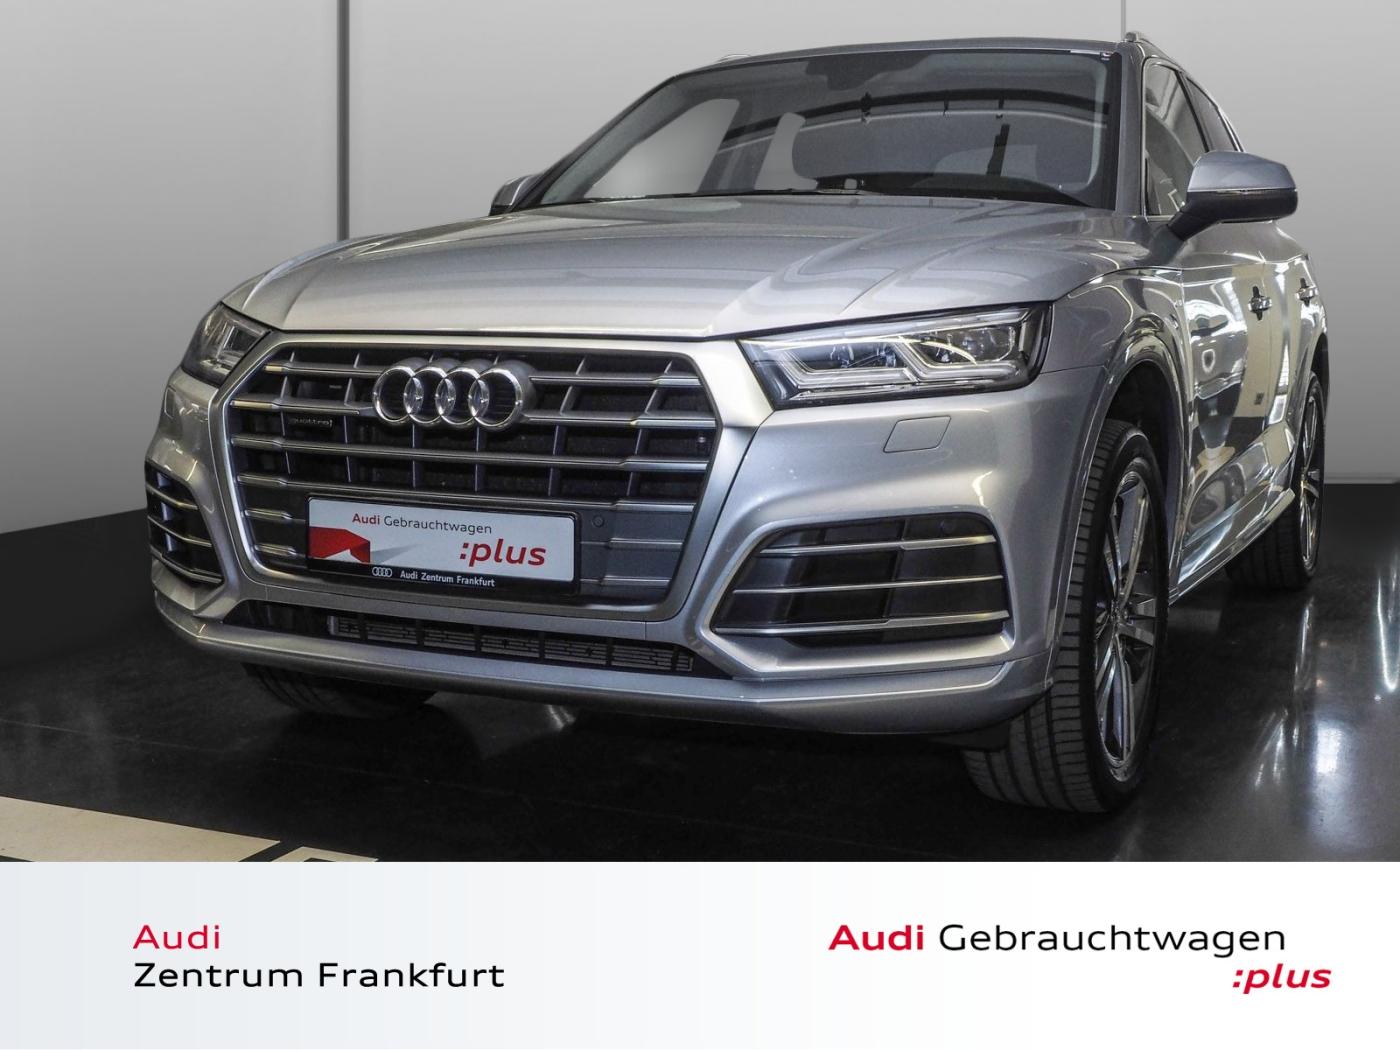 Audi Q5 2.0 TDI quattro S tronic S line Navi DAB Pano, Jahr 2017, Diesel